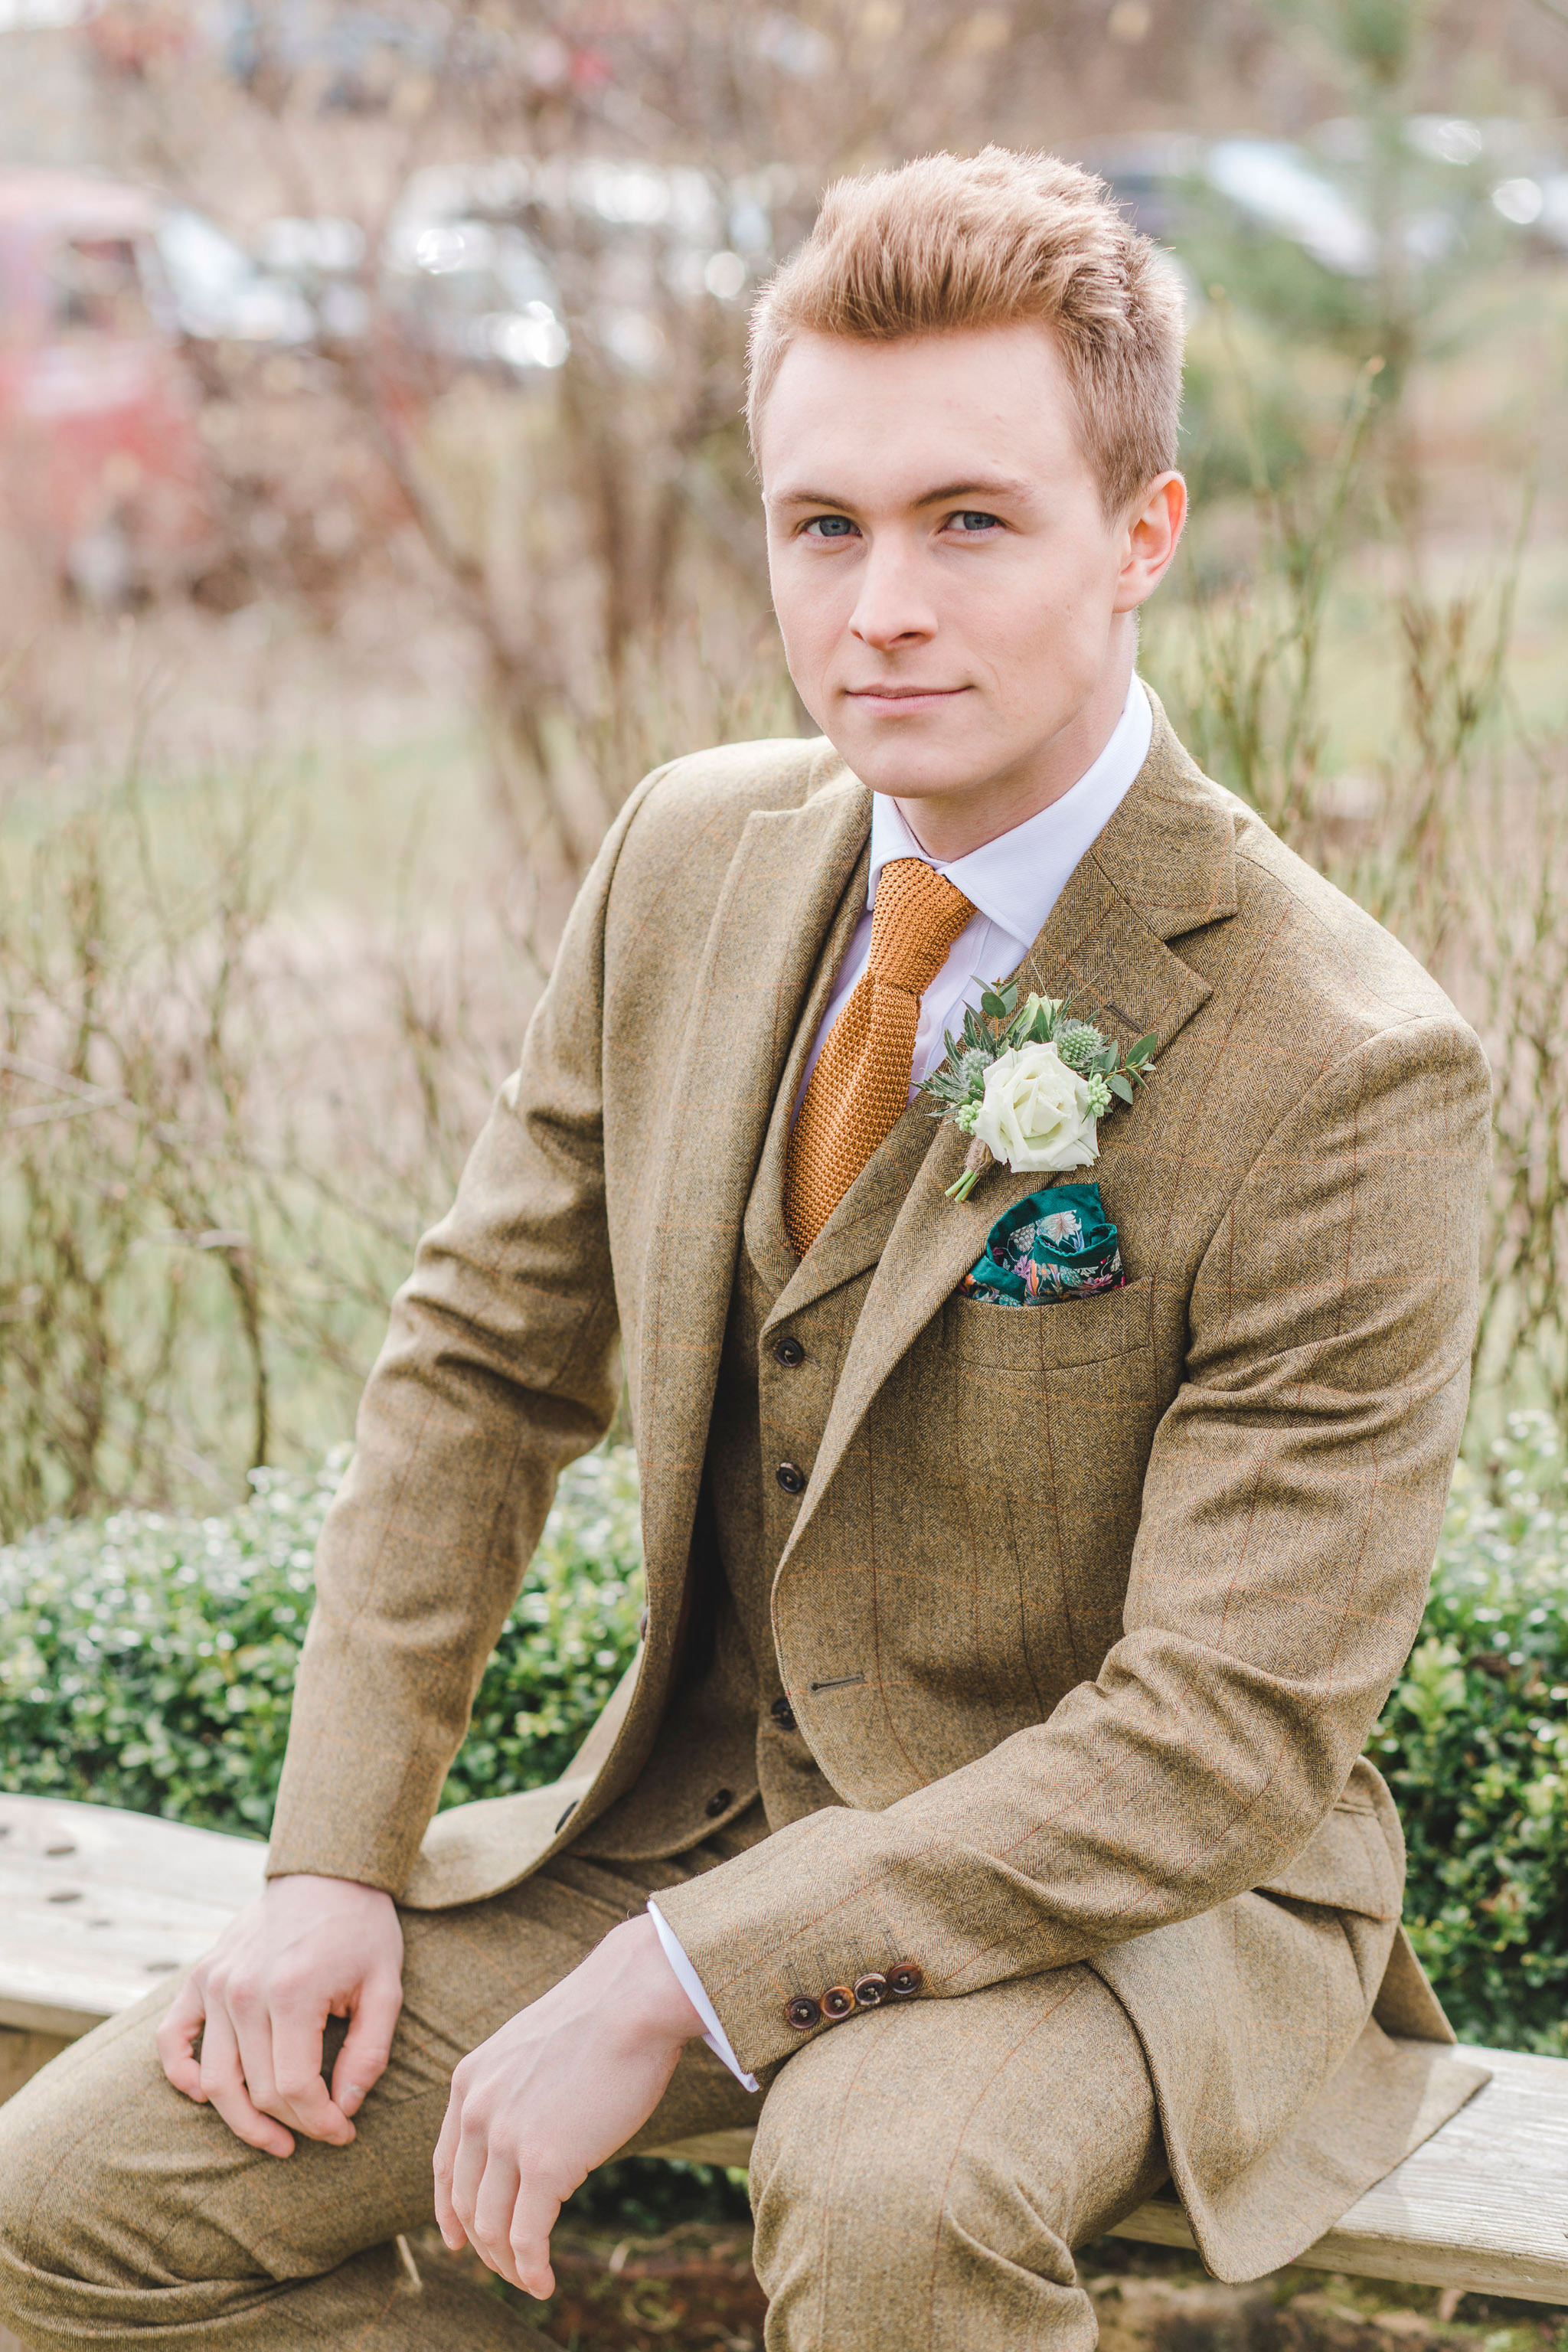 rustic-romantic-outdoor-wedding-photographer-edinburgh-17.jpg